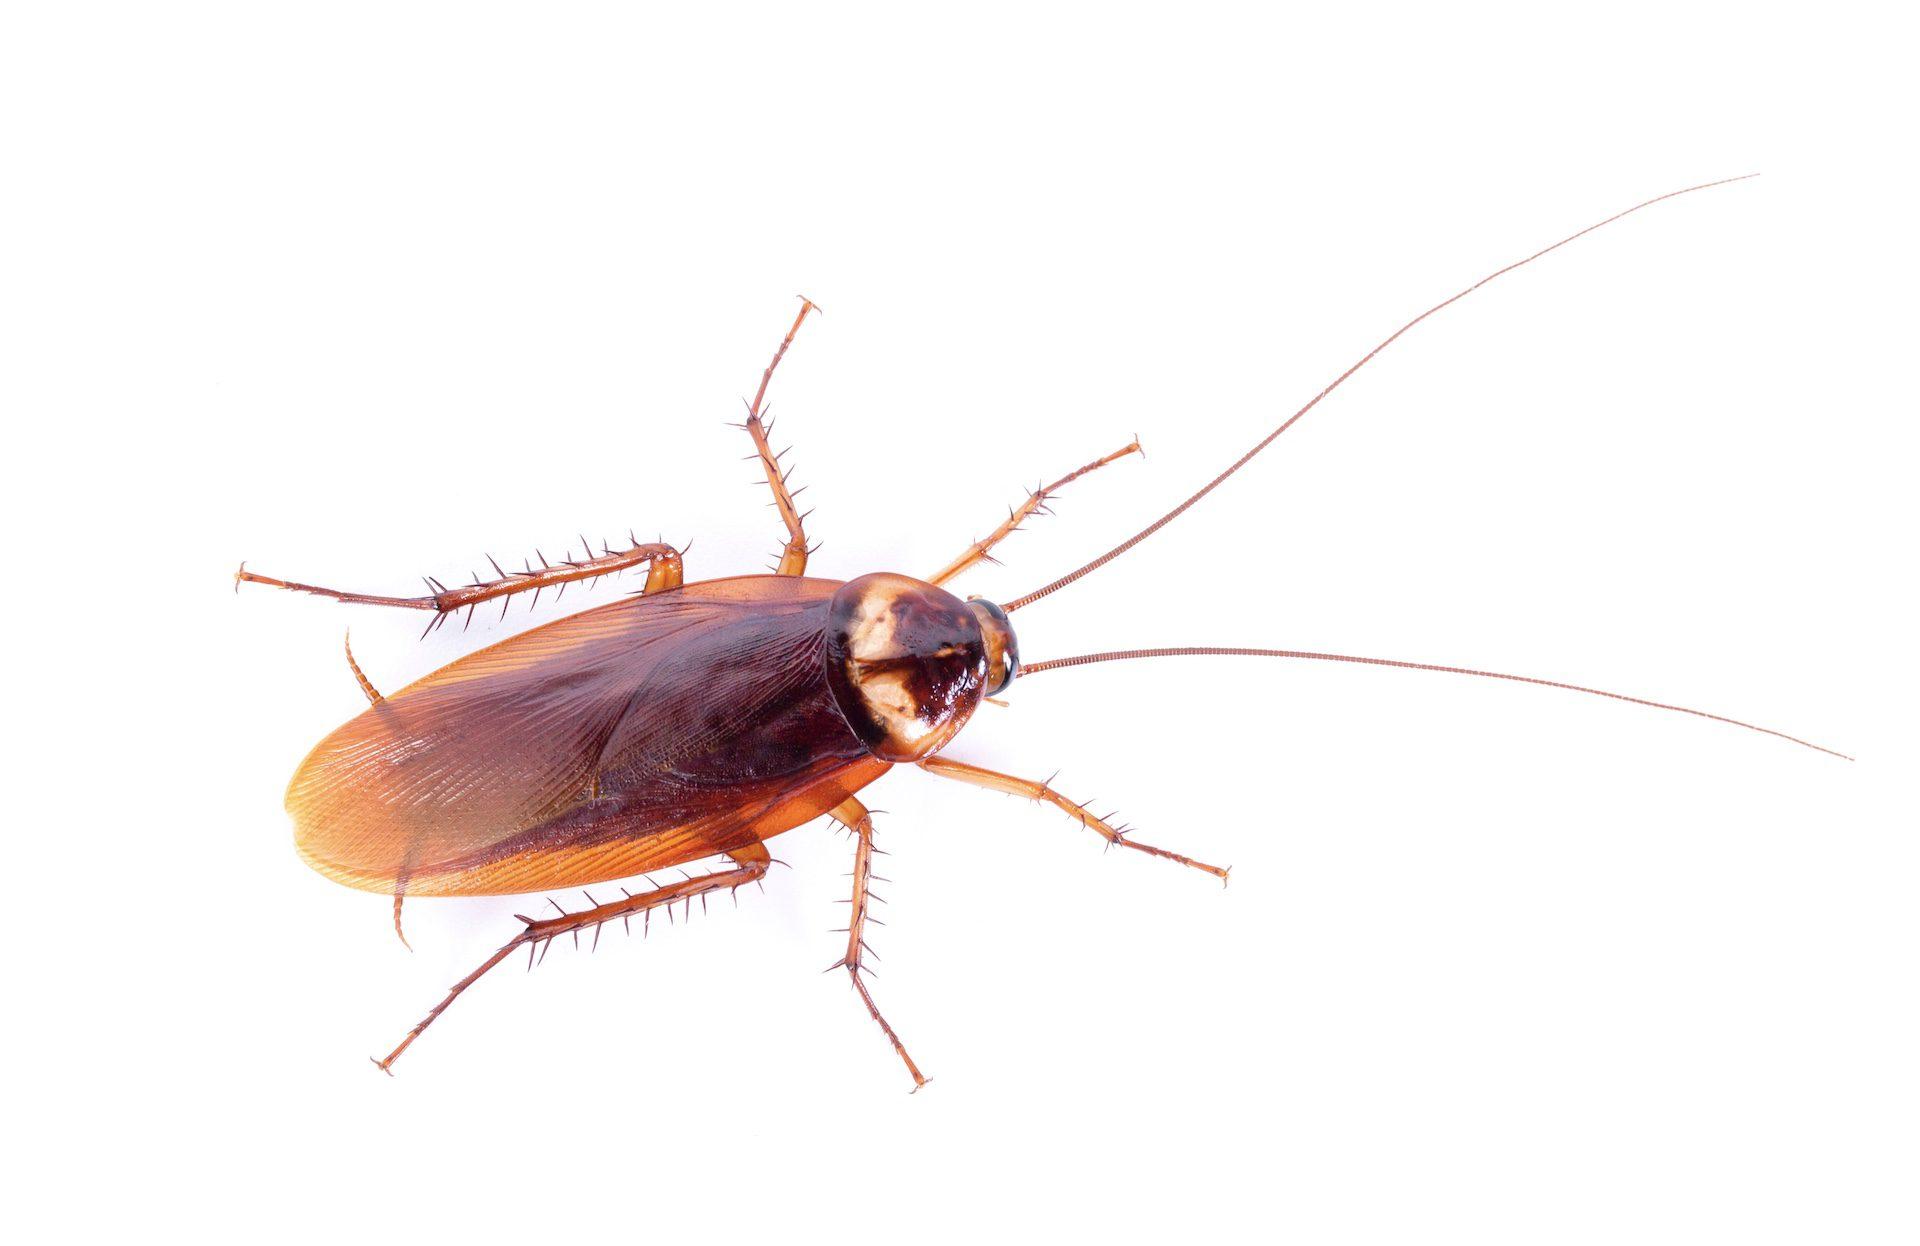 Roach Control in Nashville - Preventative Pest Control - Certified Pest Control